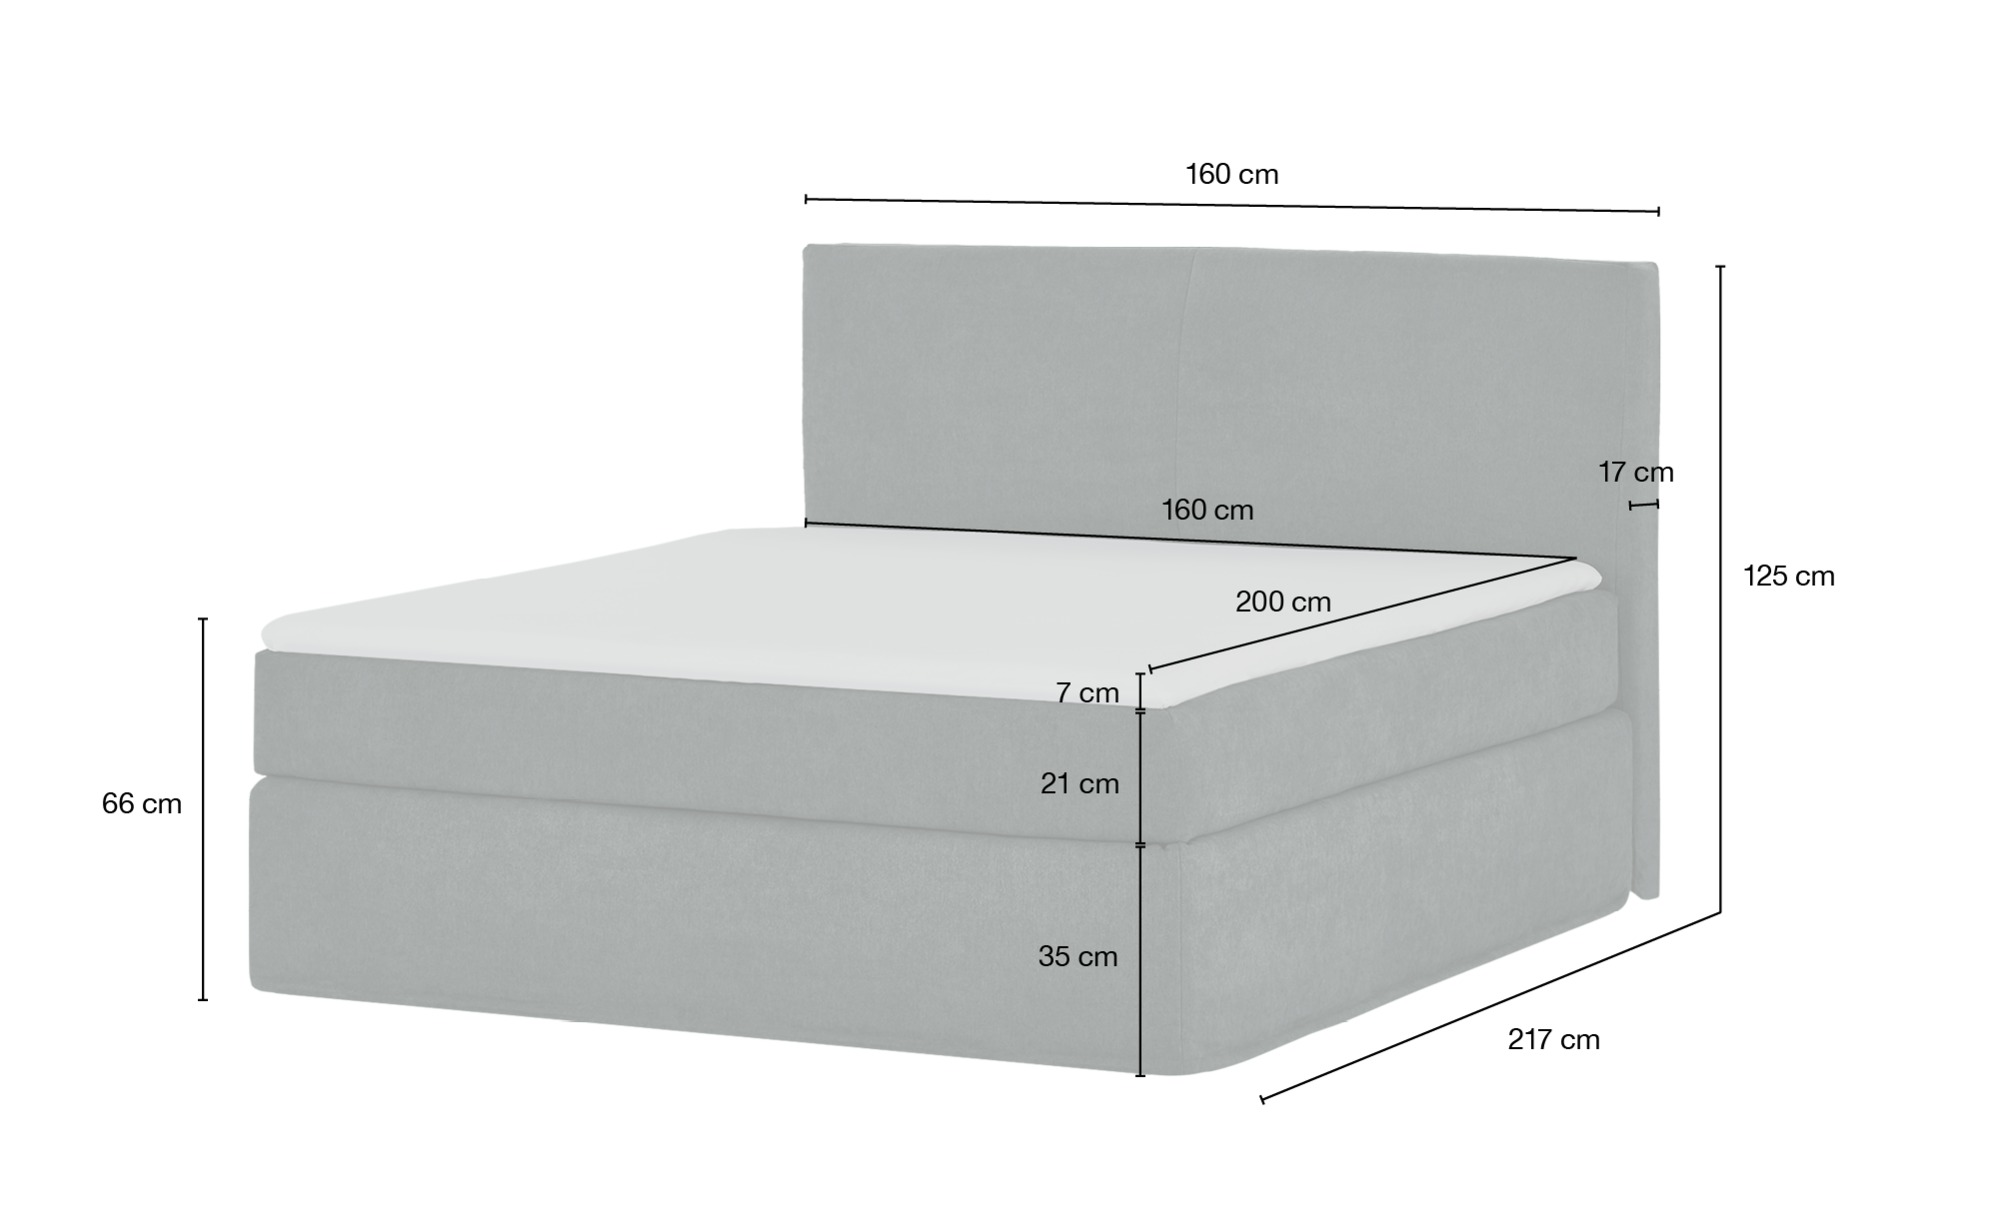 Boxspringbett 160 x 200 cm  Boxi ¦ blau ¦ Maße (cm): B: 160 H: 125 Betten > Boxspringbetten > Boxspringbetten 160x200 - Höffner